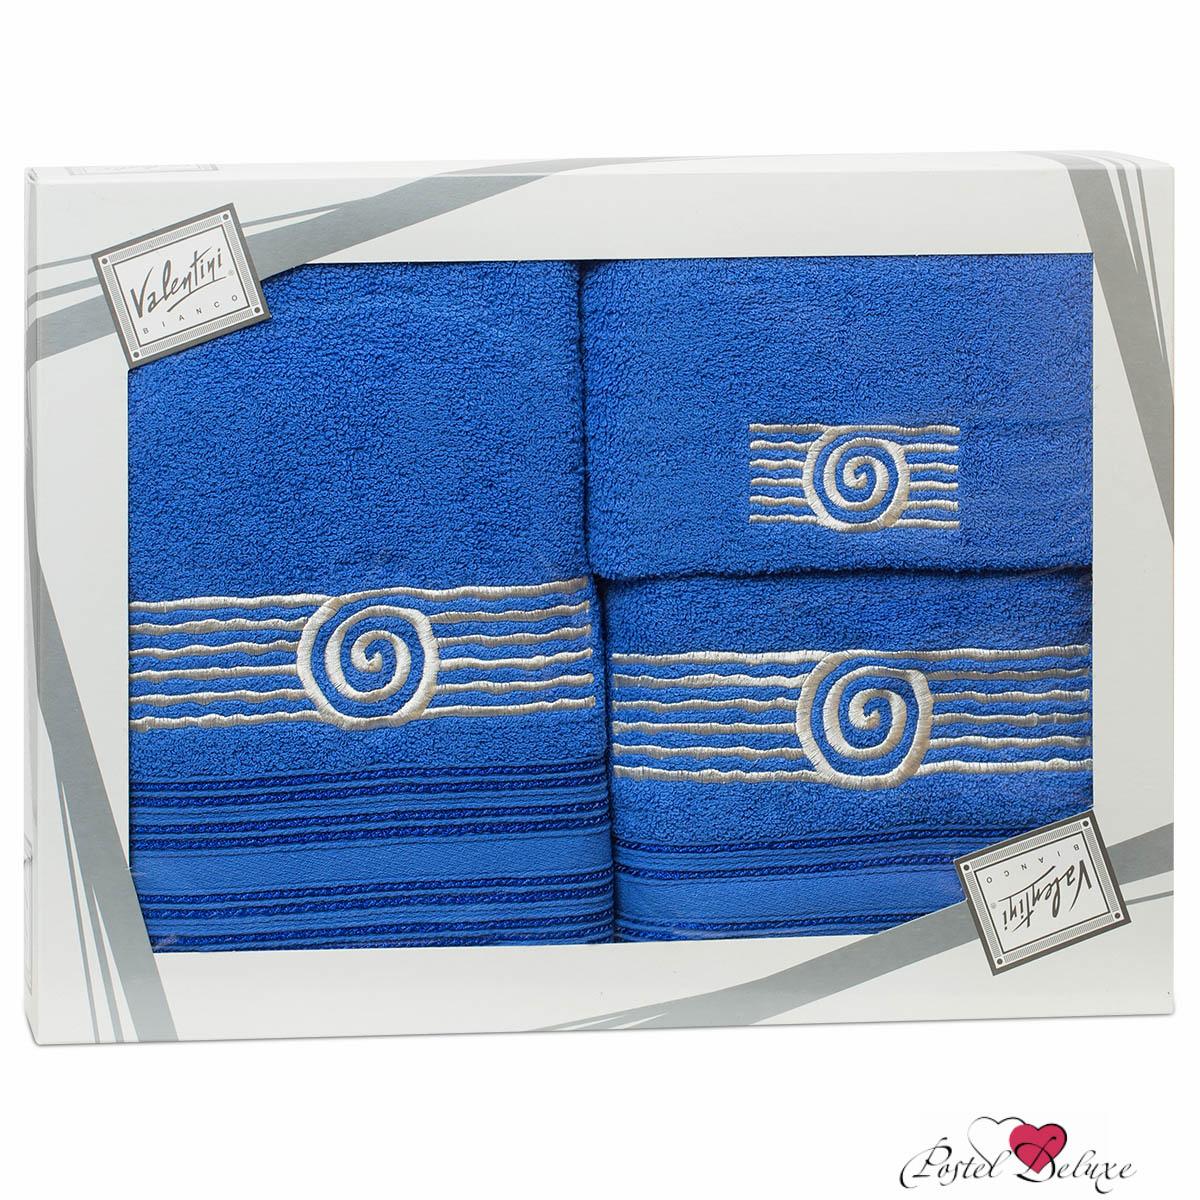 Полотенца Valentini Полотенце Sea Цвет: Синий (Набор) ваза для хранения chel sea h51 см